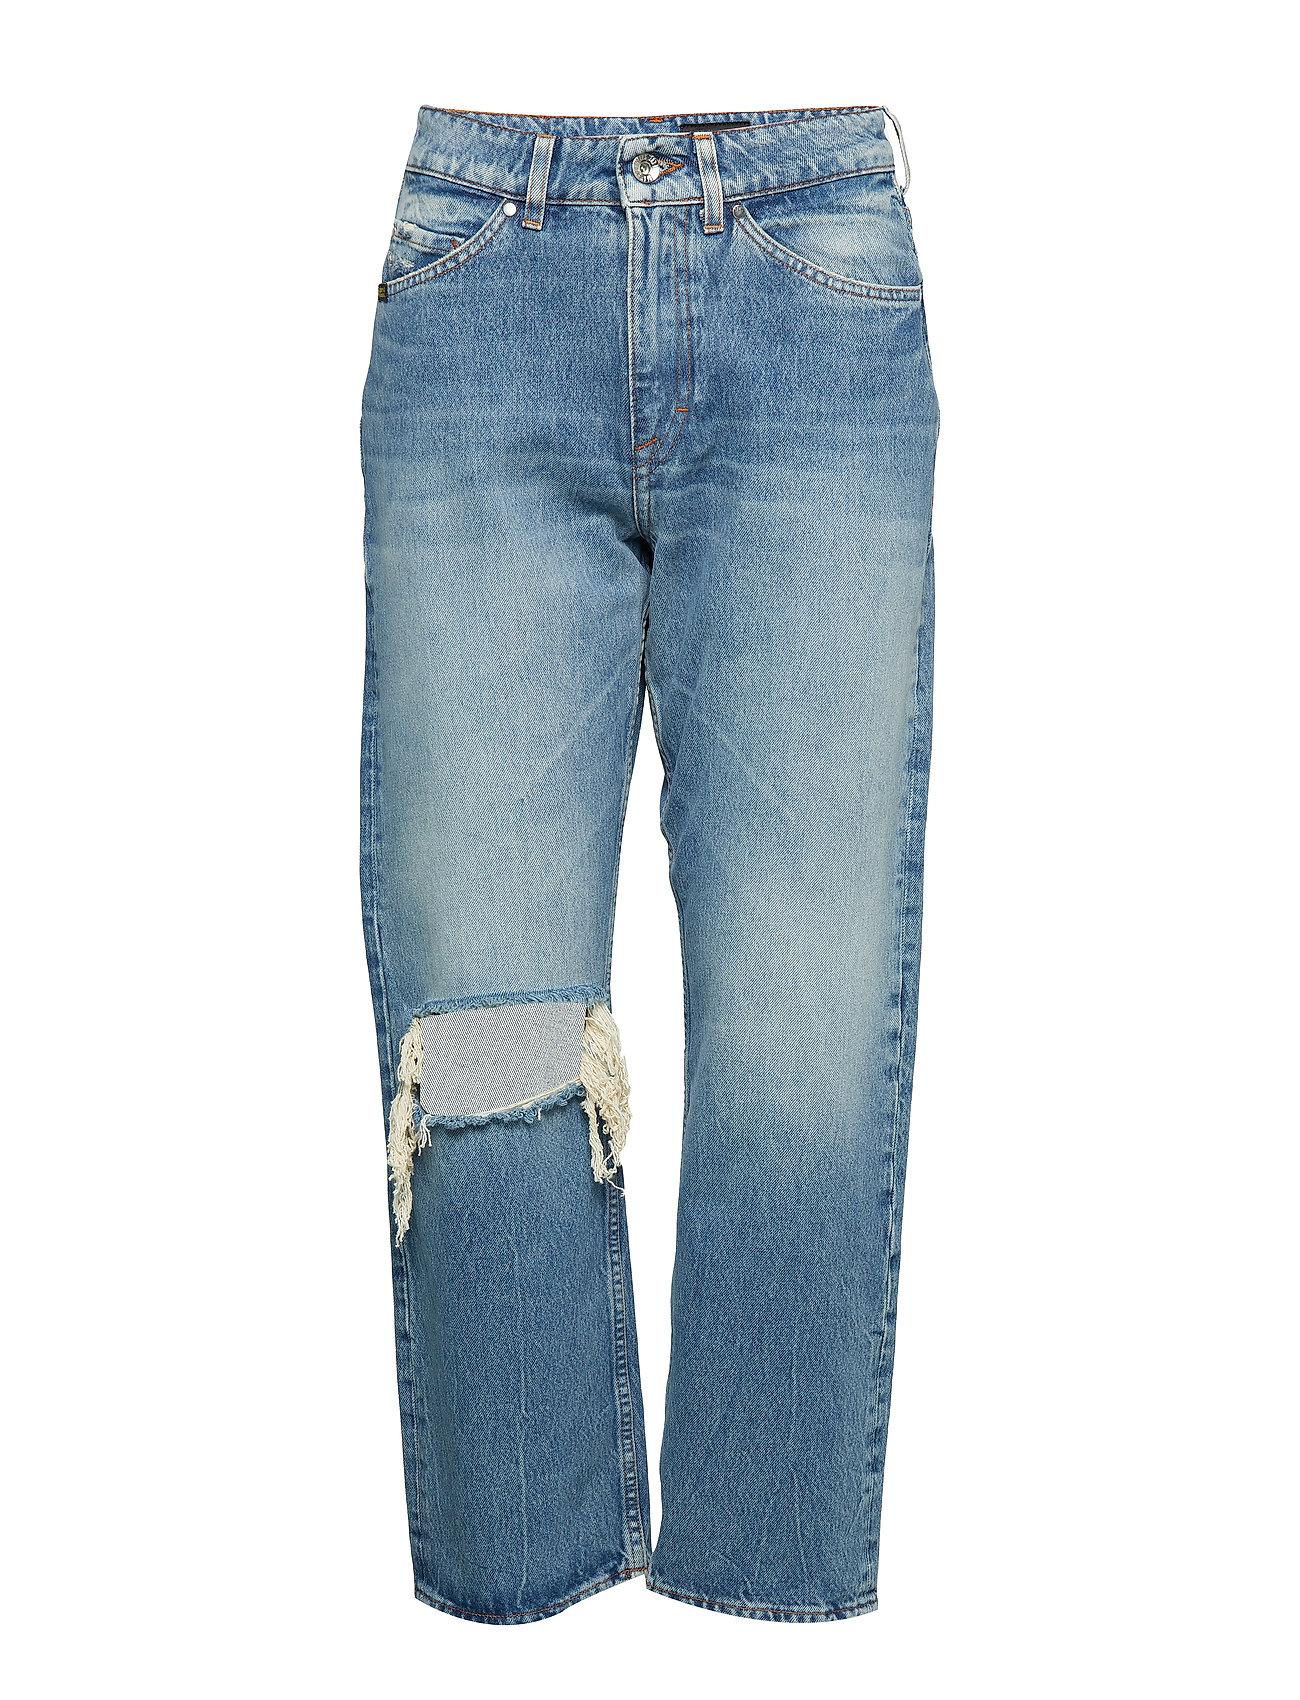 Tiger of Sweden Jeans DROPPED